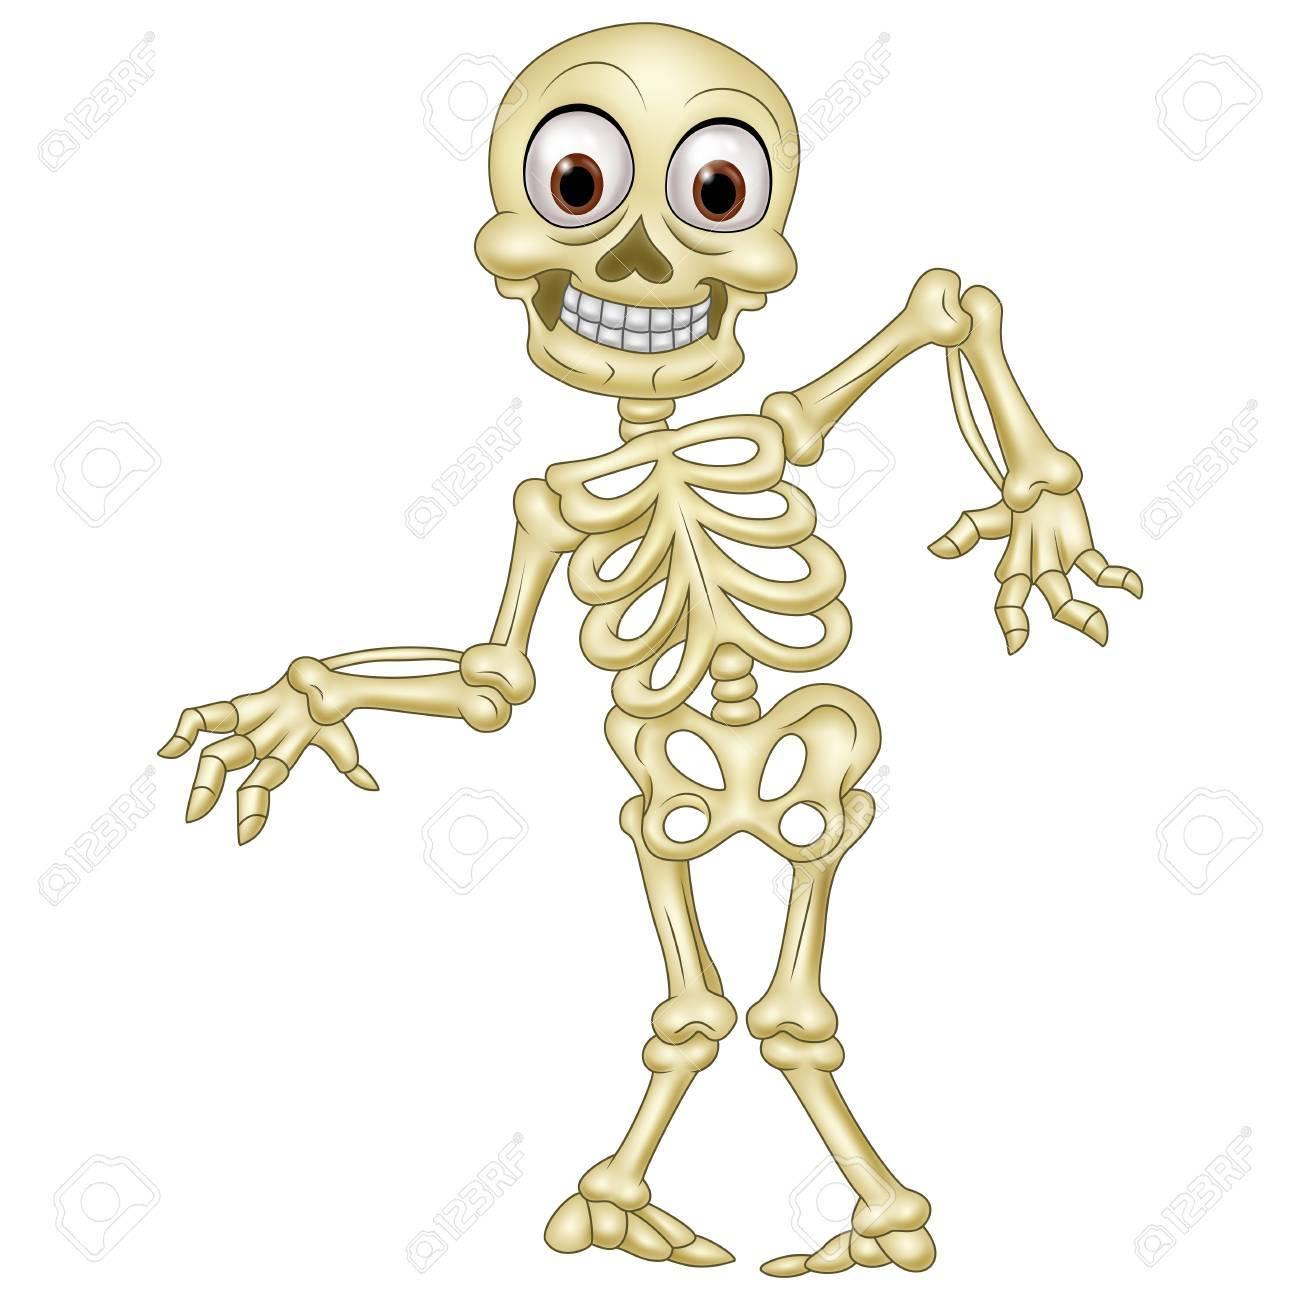 Halloween Skeleton.Illustration Of Halloween Skeleton